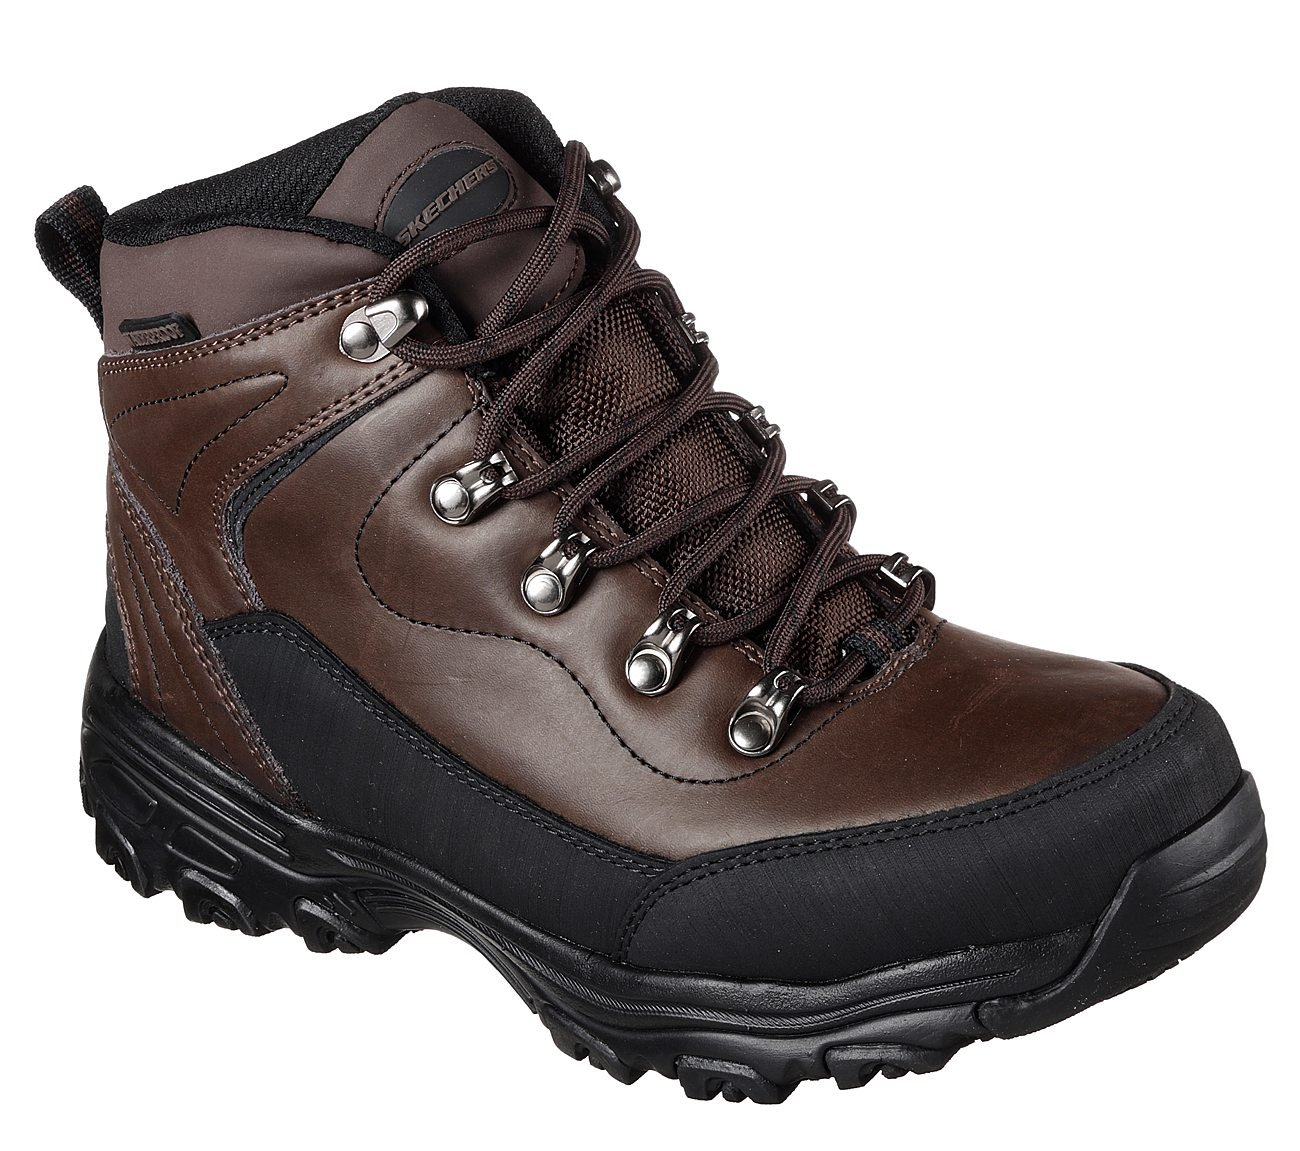 Skechers Work D'Lites SR Chitina WP Womens Slip Resistant Boots B077G57CTR 10 B(M) US|Dark Brown